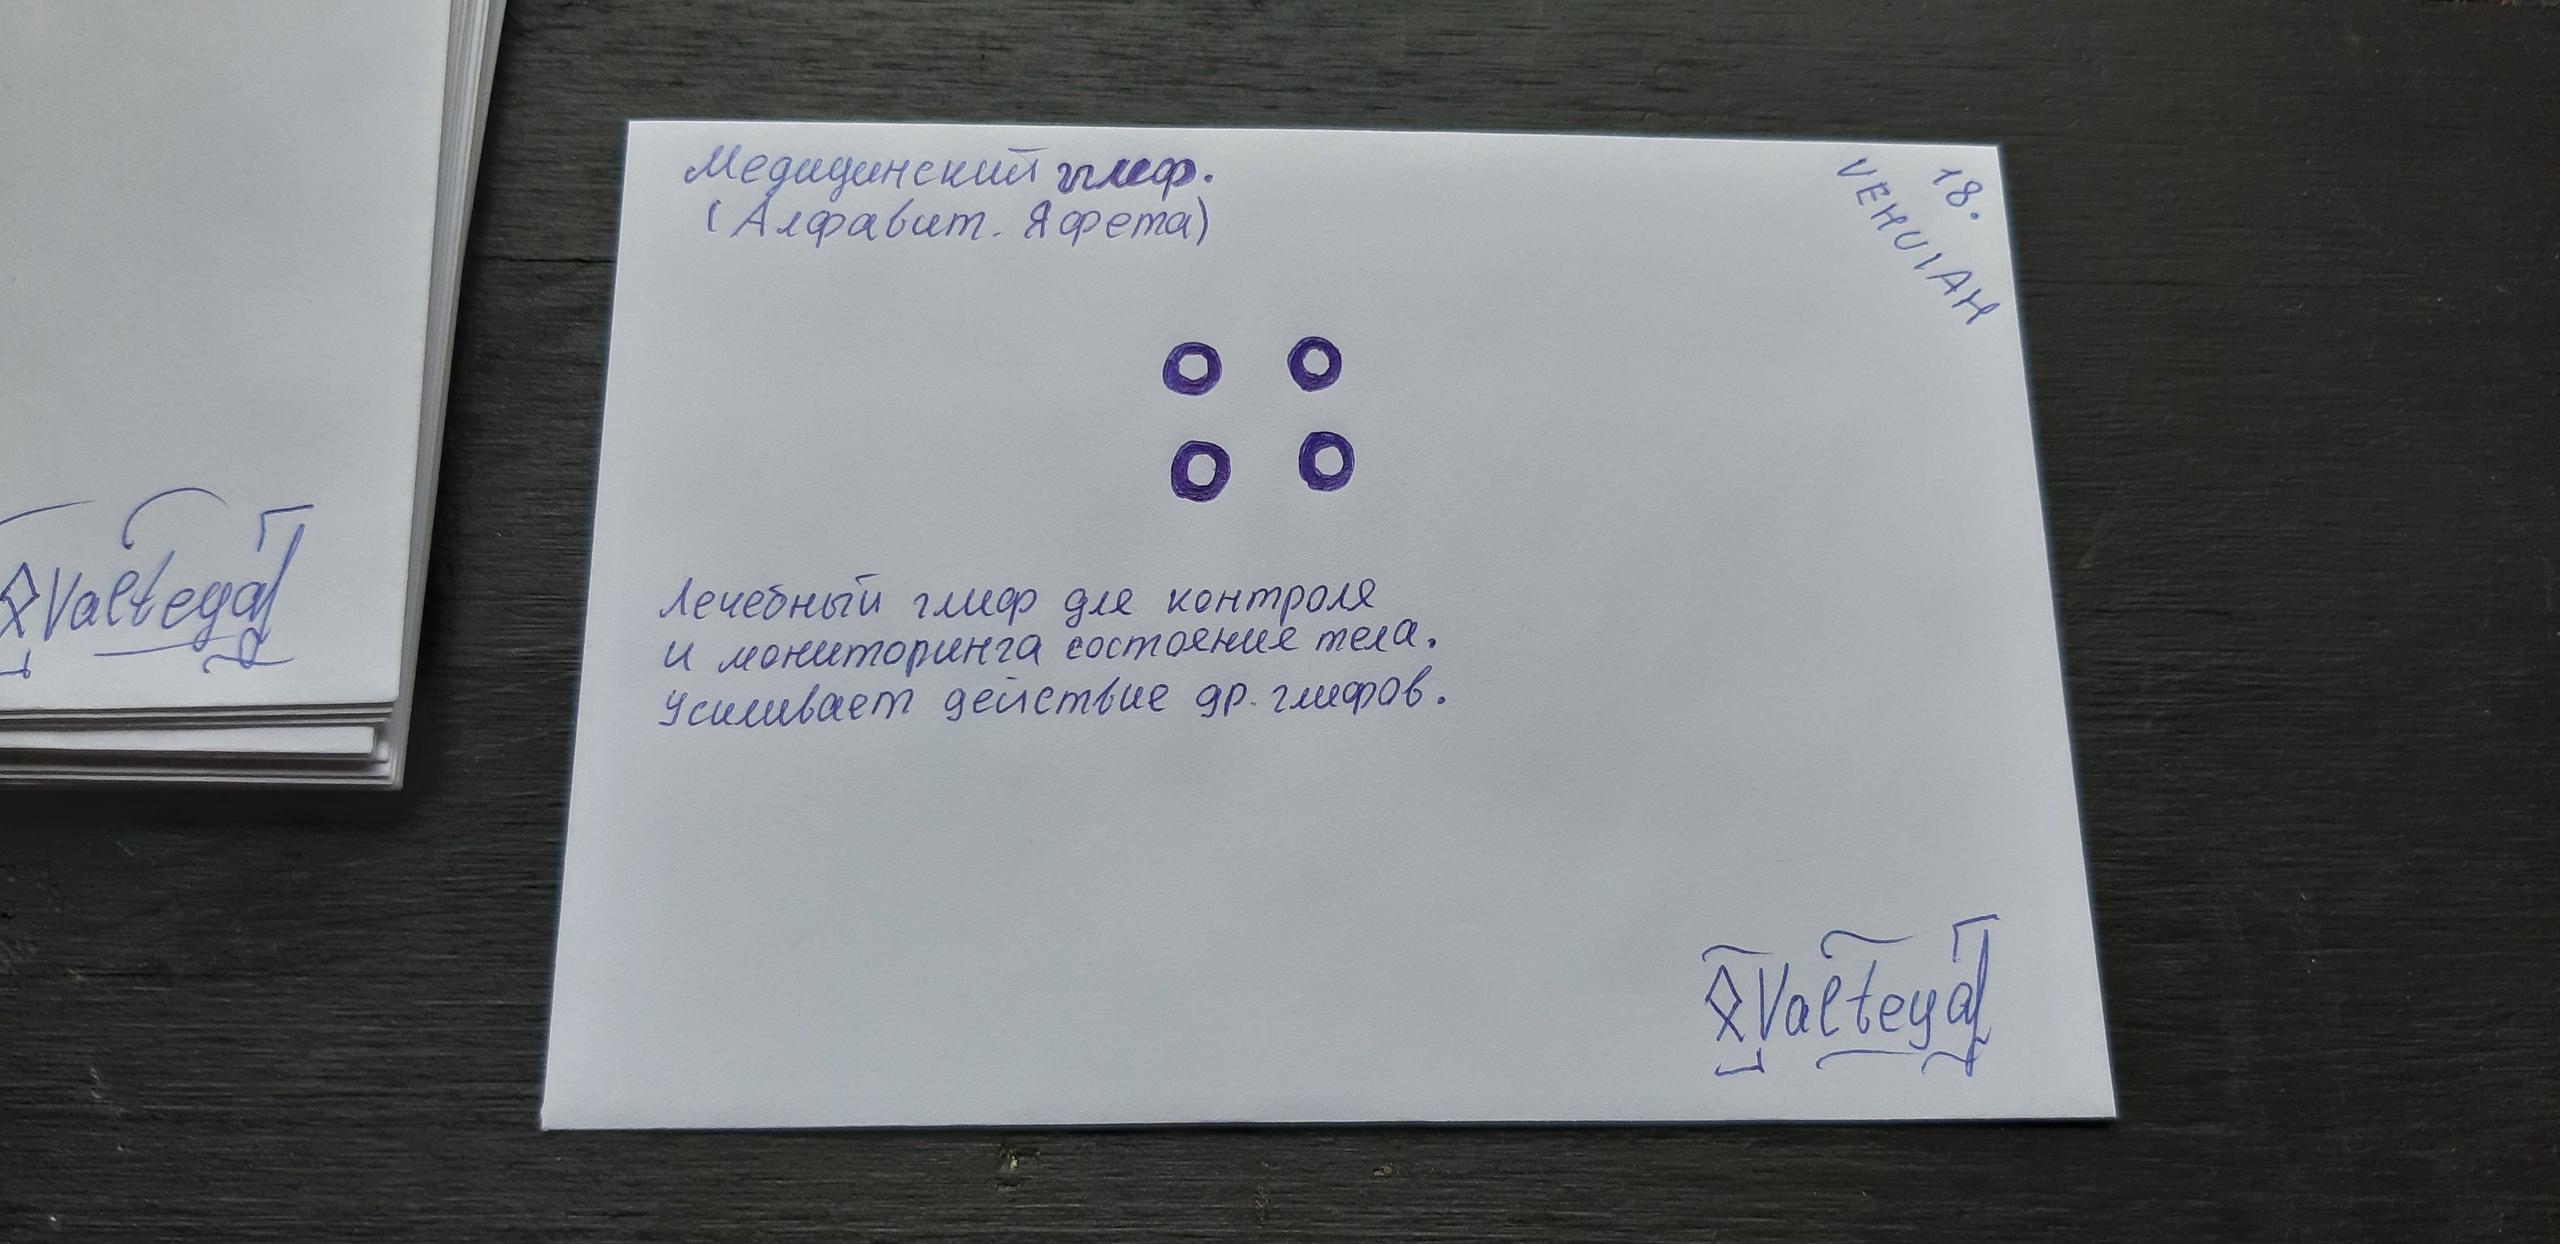 Конверты медицинские глифы. Алфавит Яфета F7GnBZ2rWmo